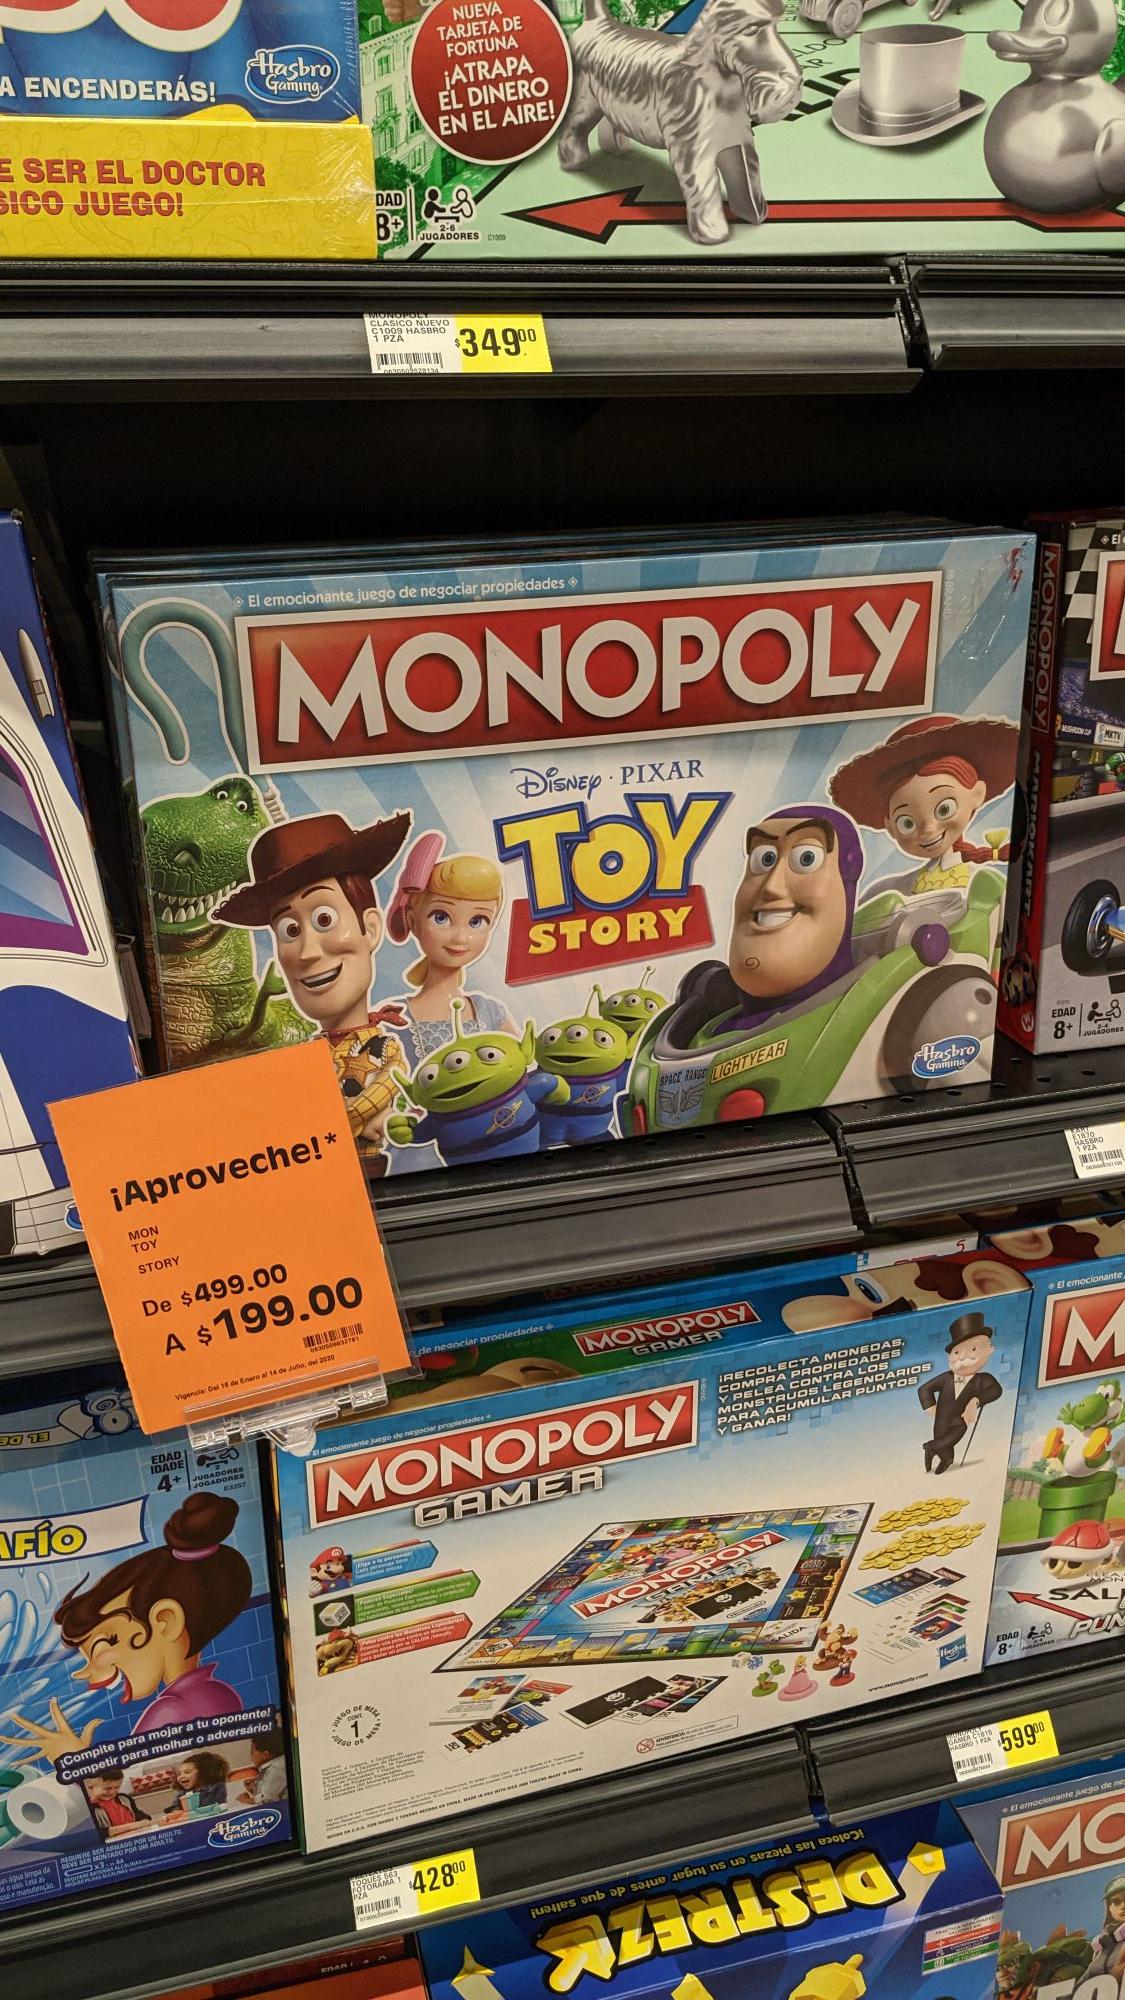 Fresko: Monopoly Toy Story